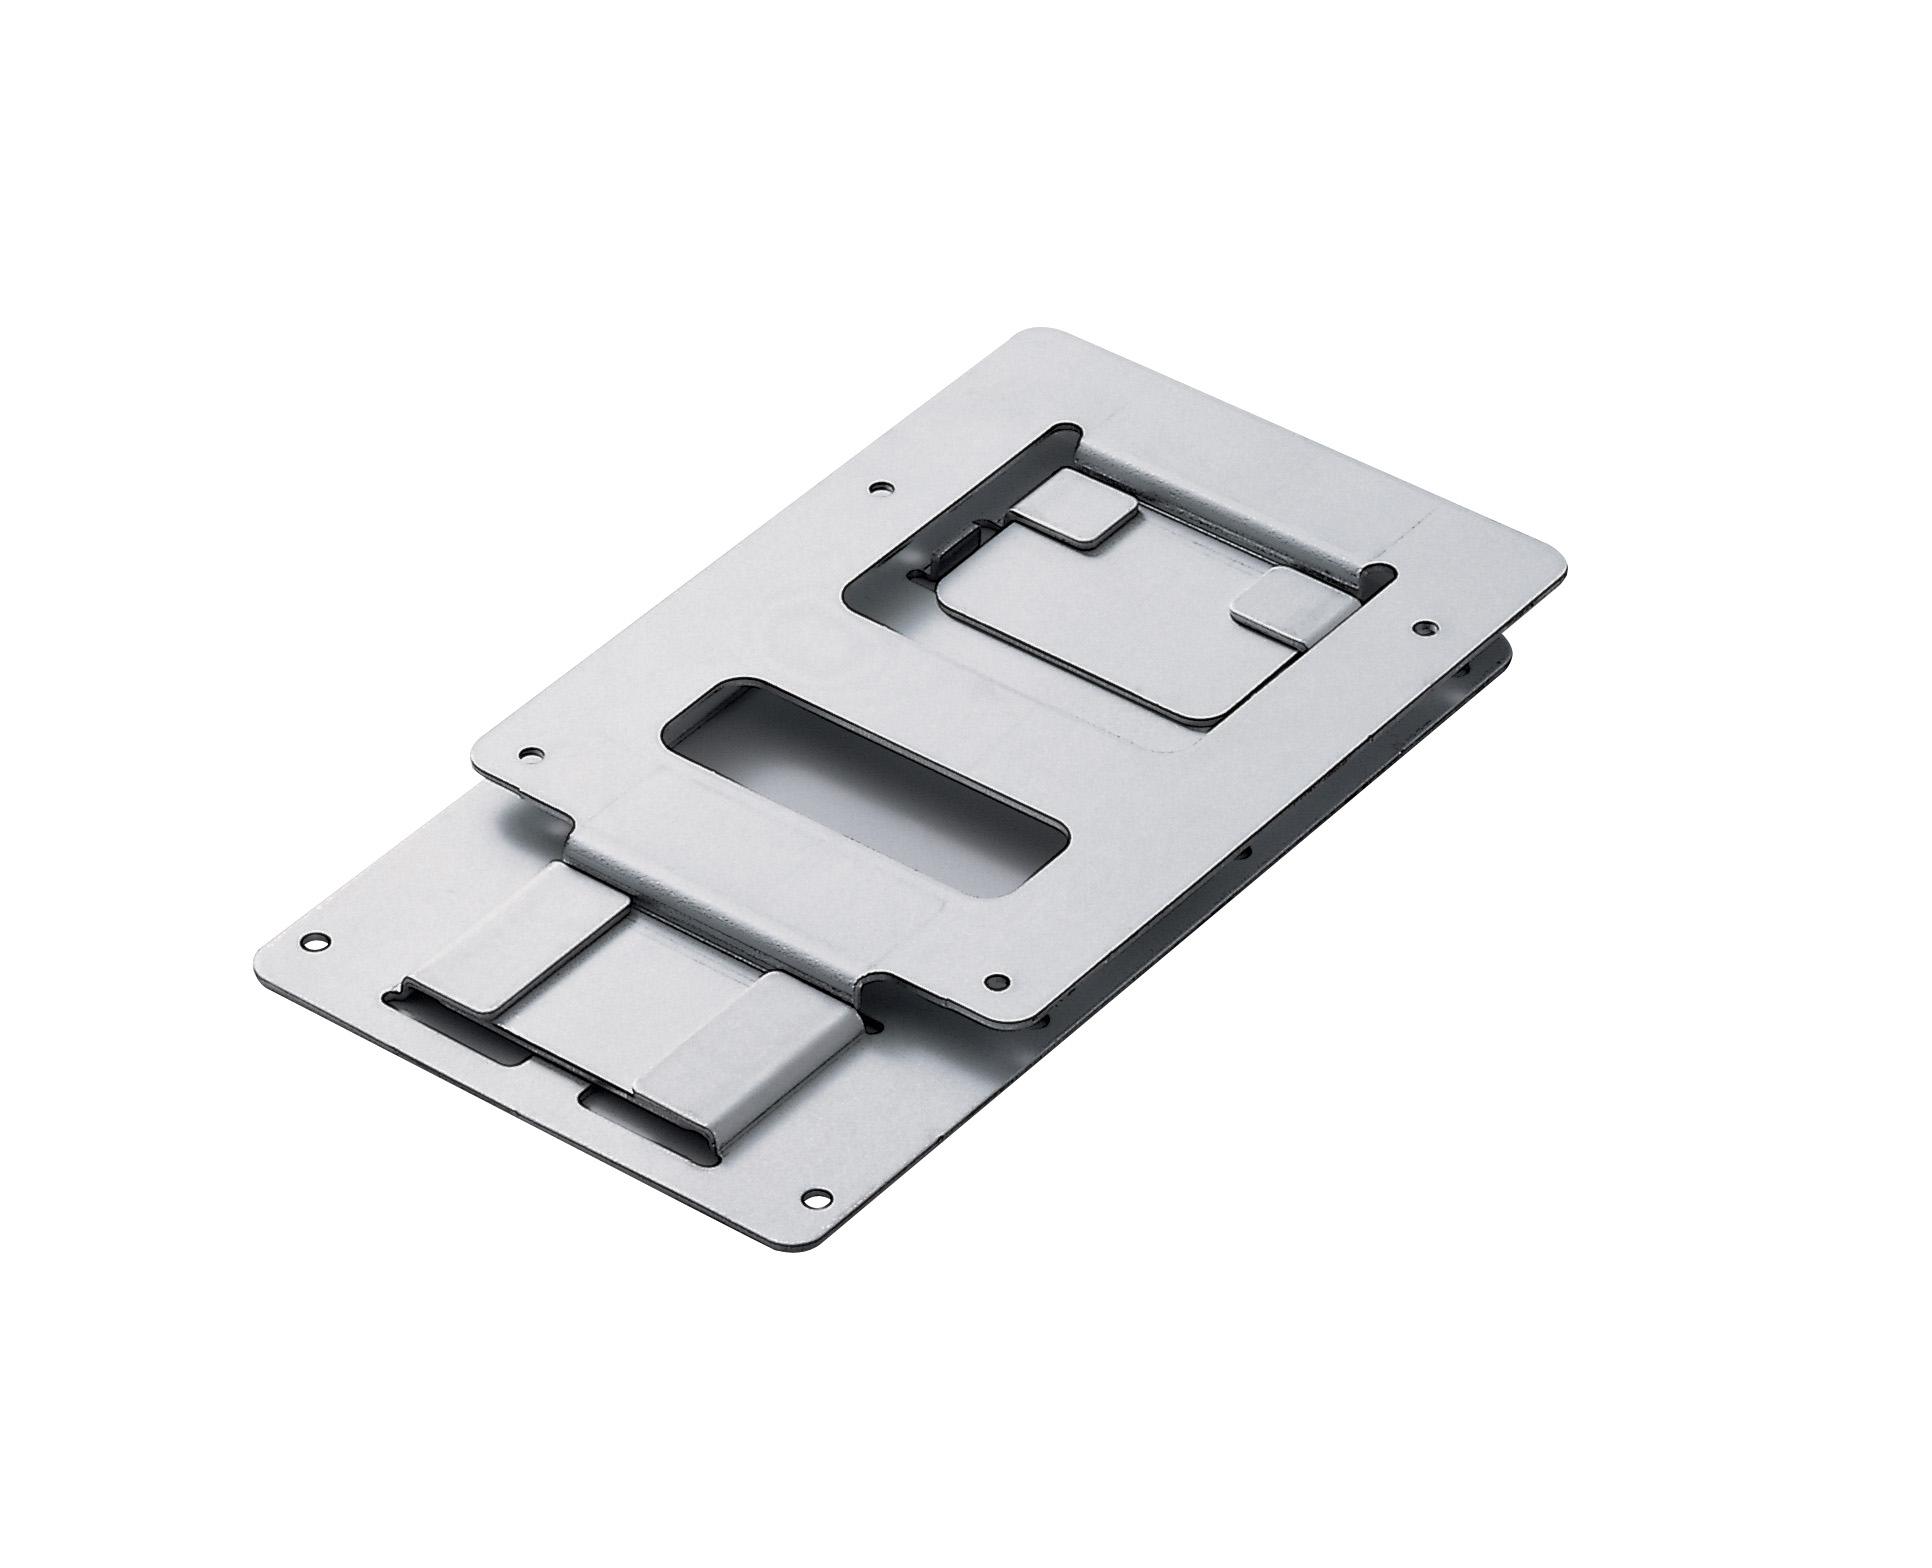 Bixolon RWM-350 flat panel wall mount